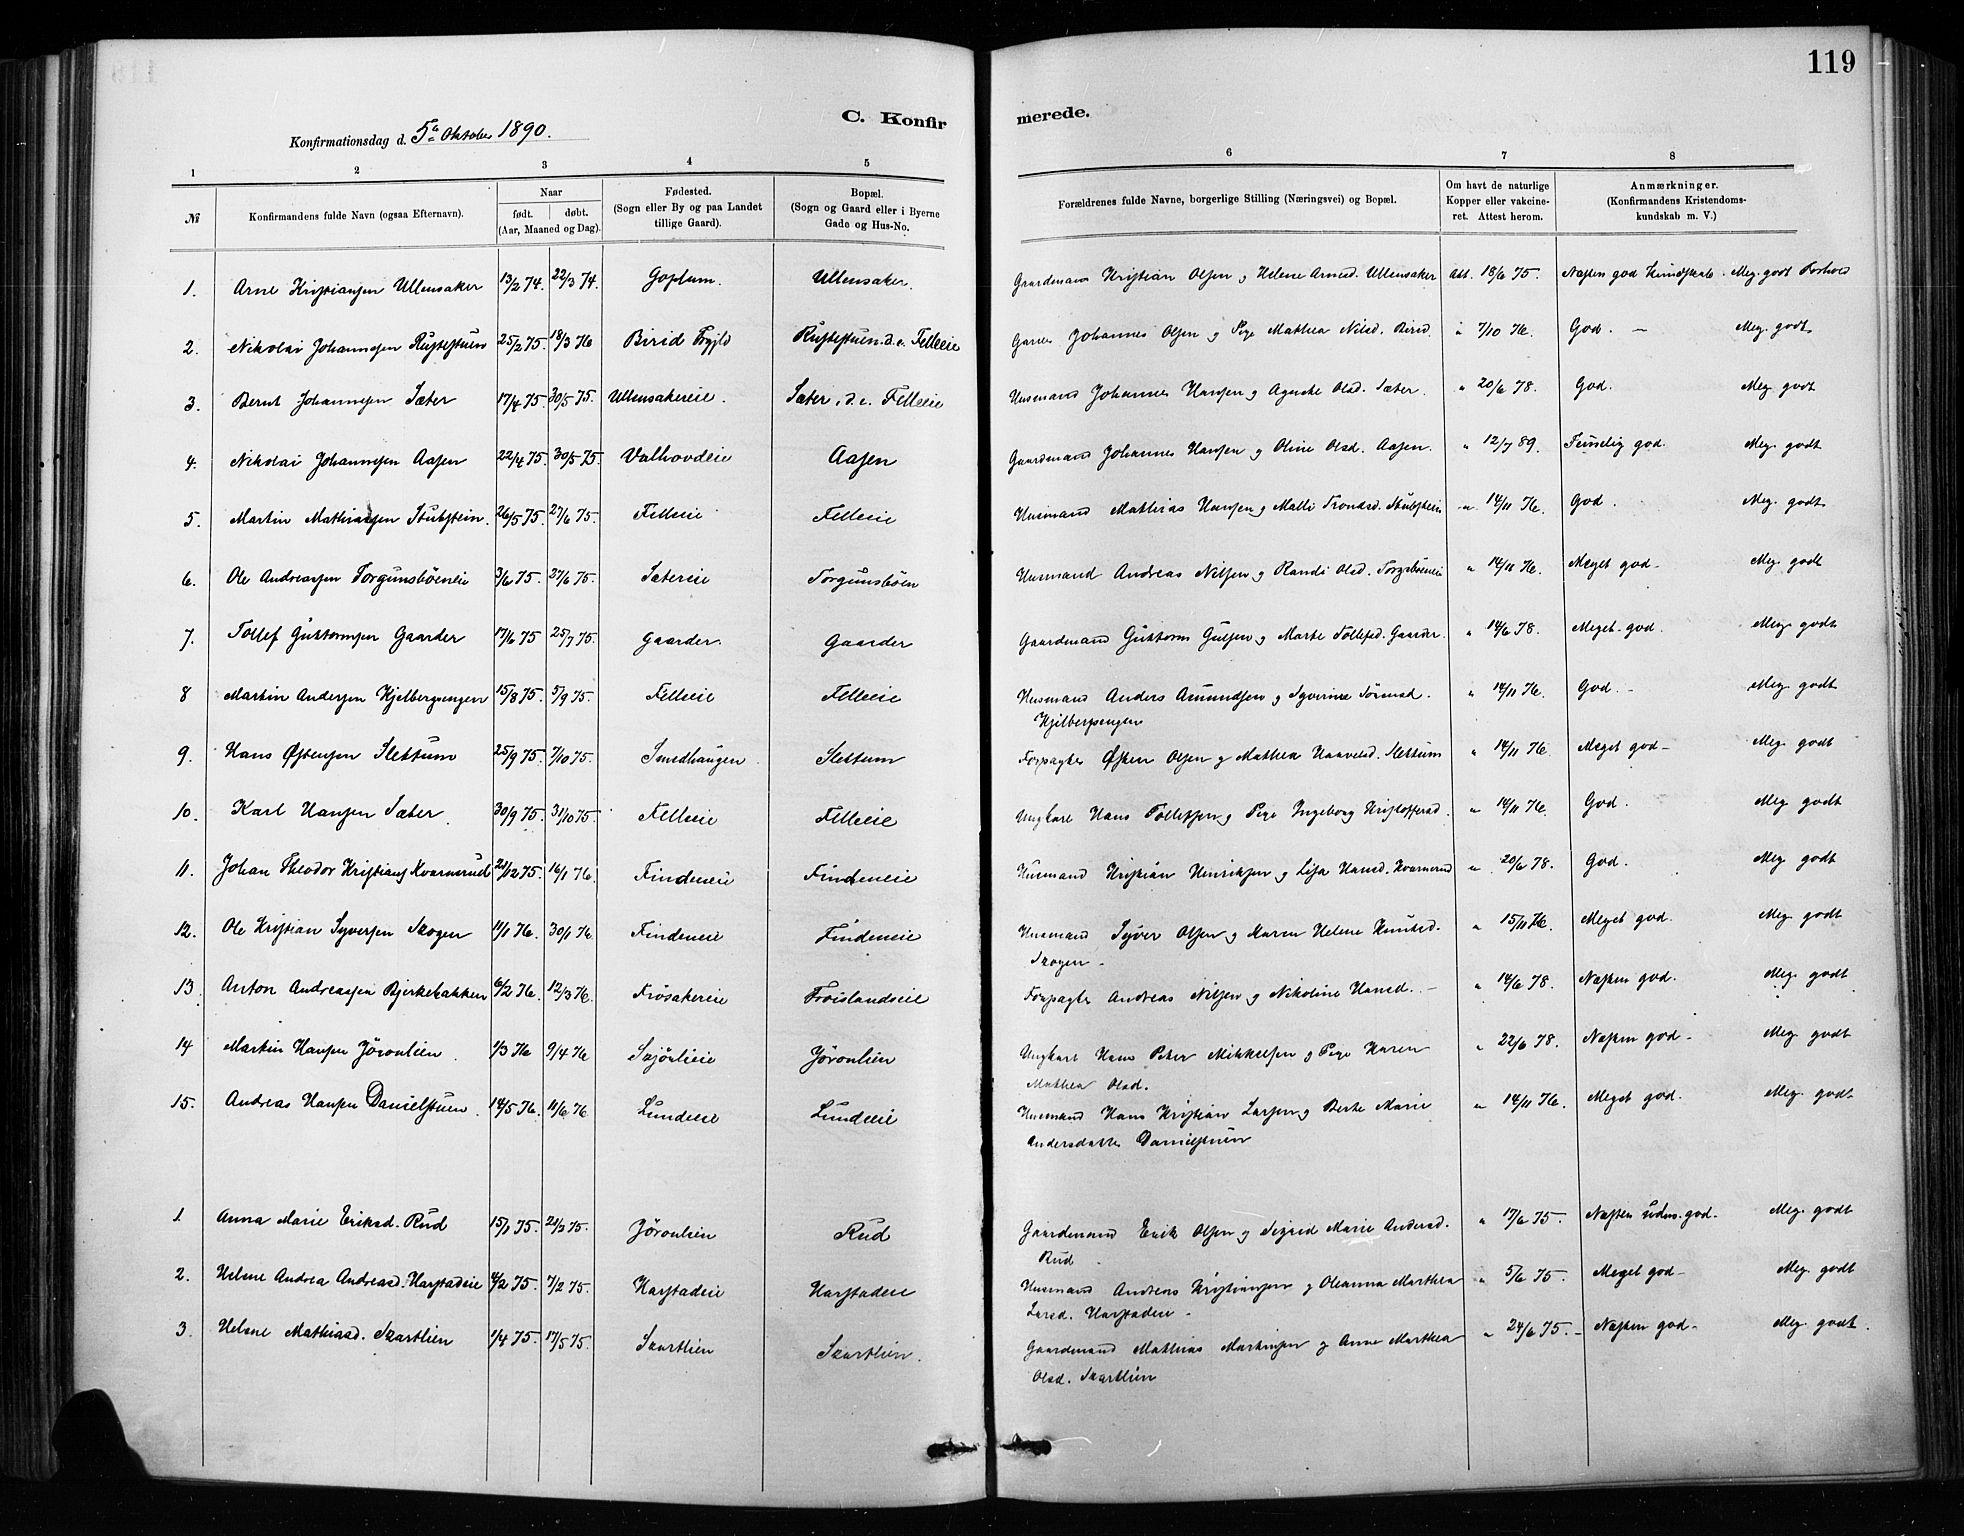 SAH, Nordre Land prestekontor, Ministerialbok nr. 4, 1882-1896, s. 119